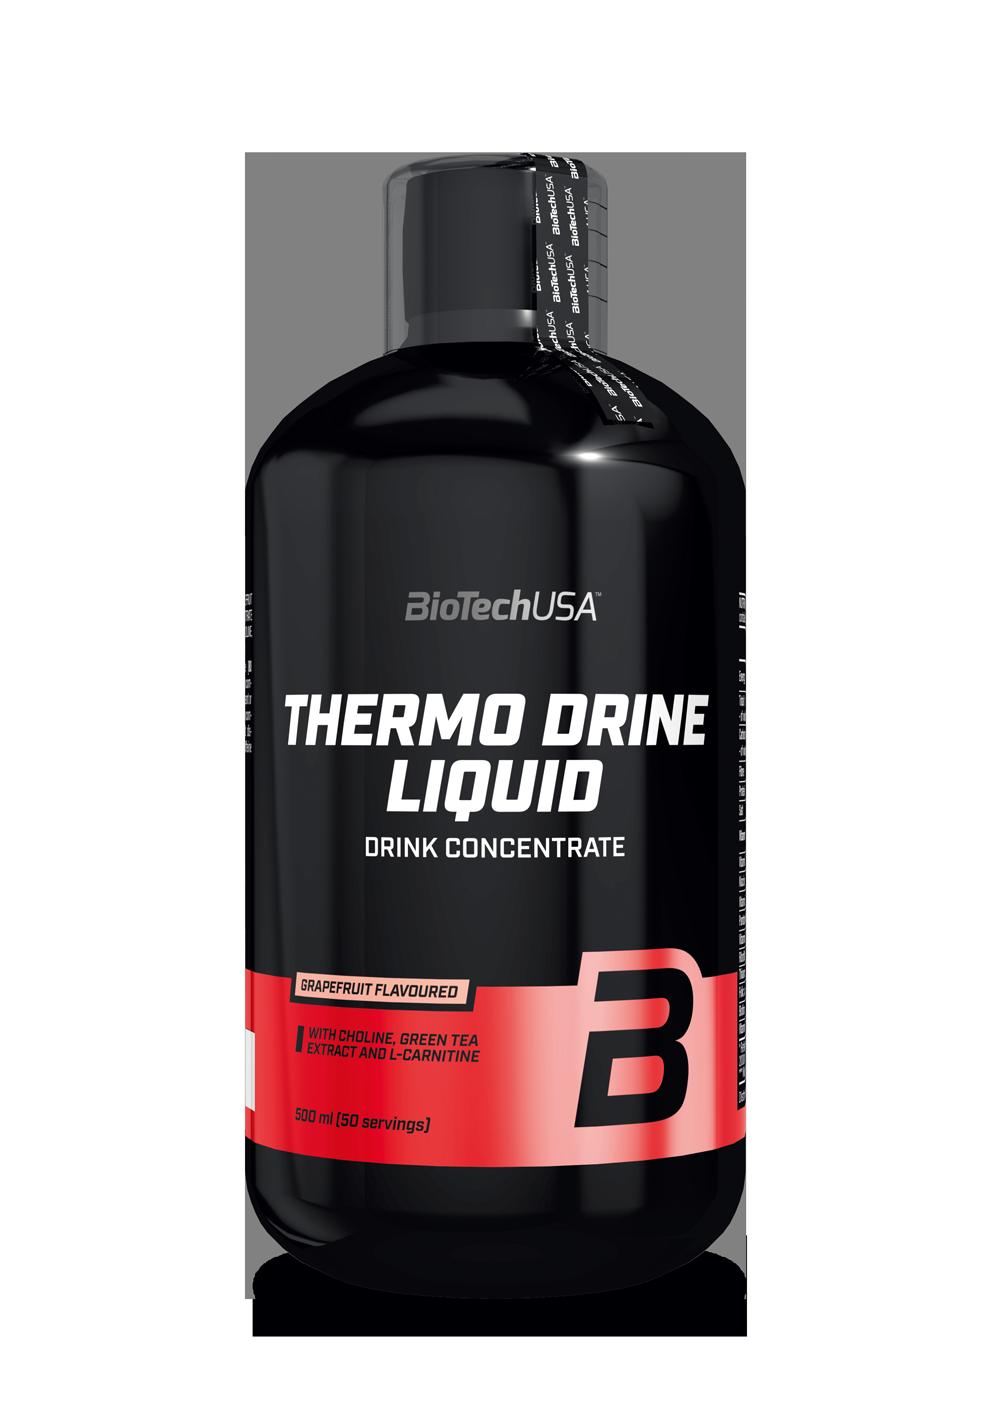 thermo drine liquid vélemények